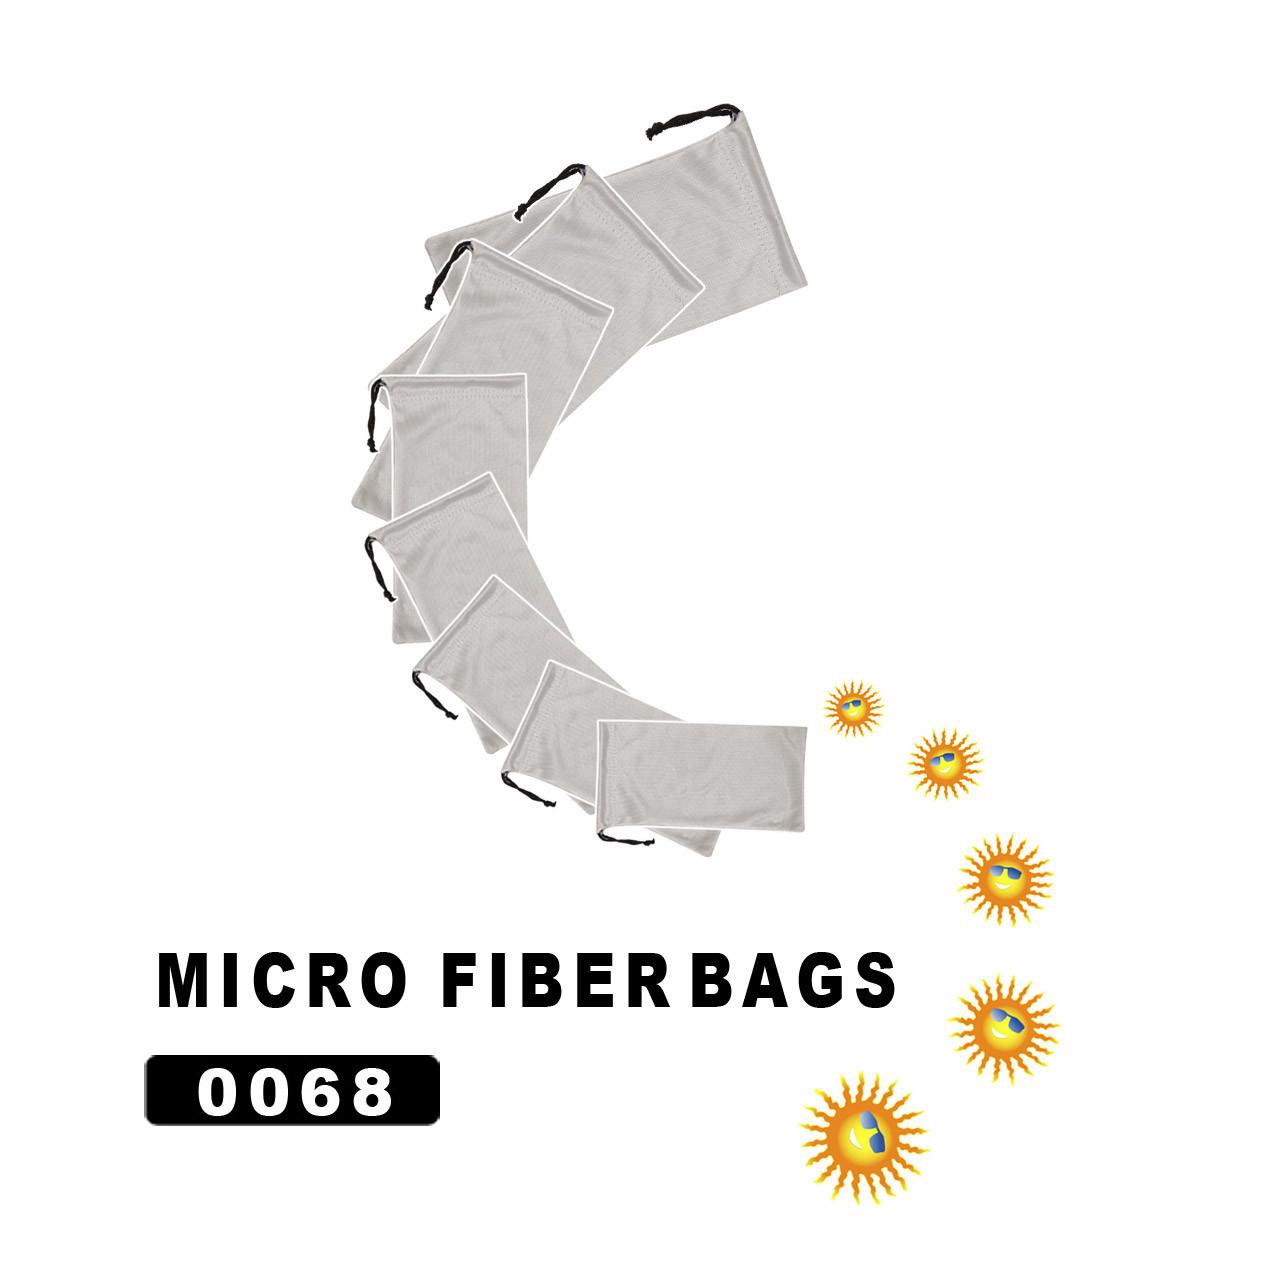 Silver Microfiber Sunglasses Storage Bags 0068